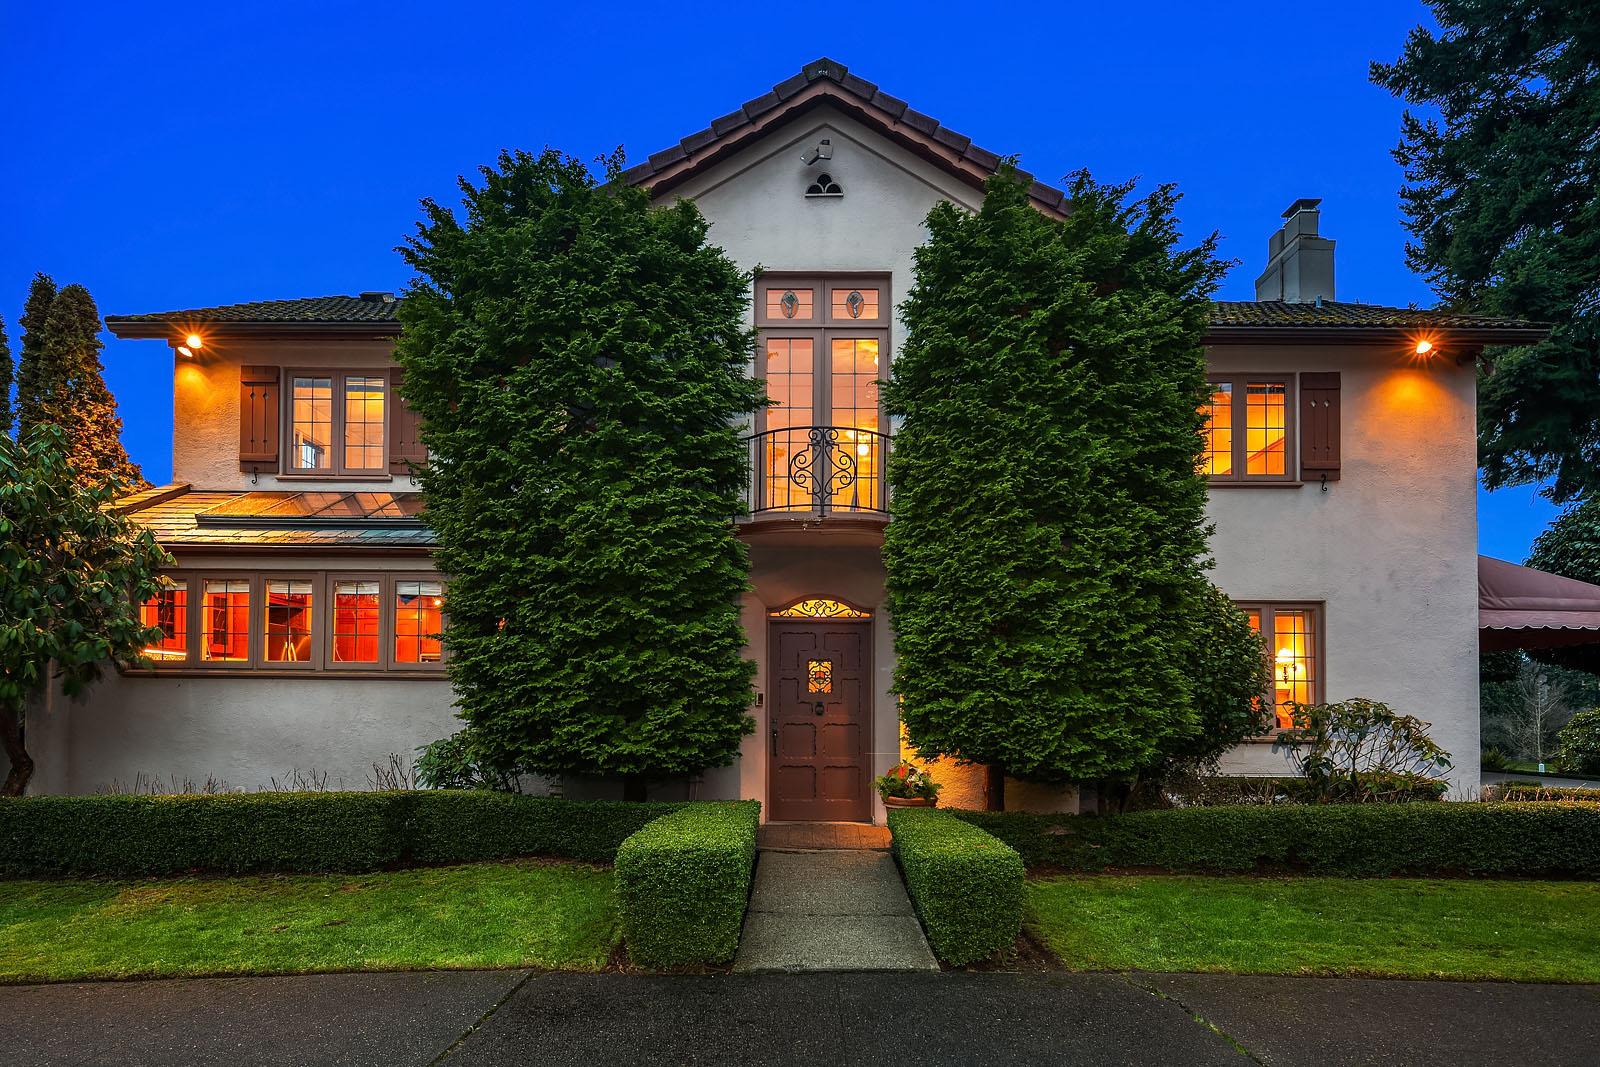 1269 Parkside Ave E | $2,200,000